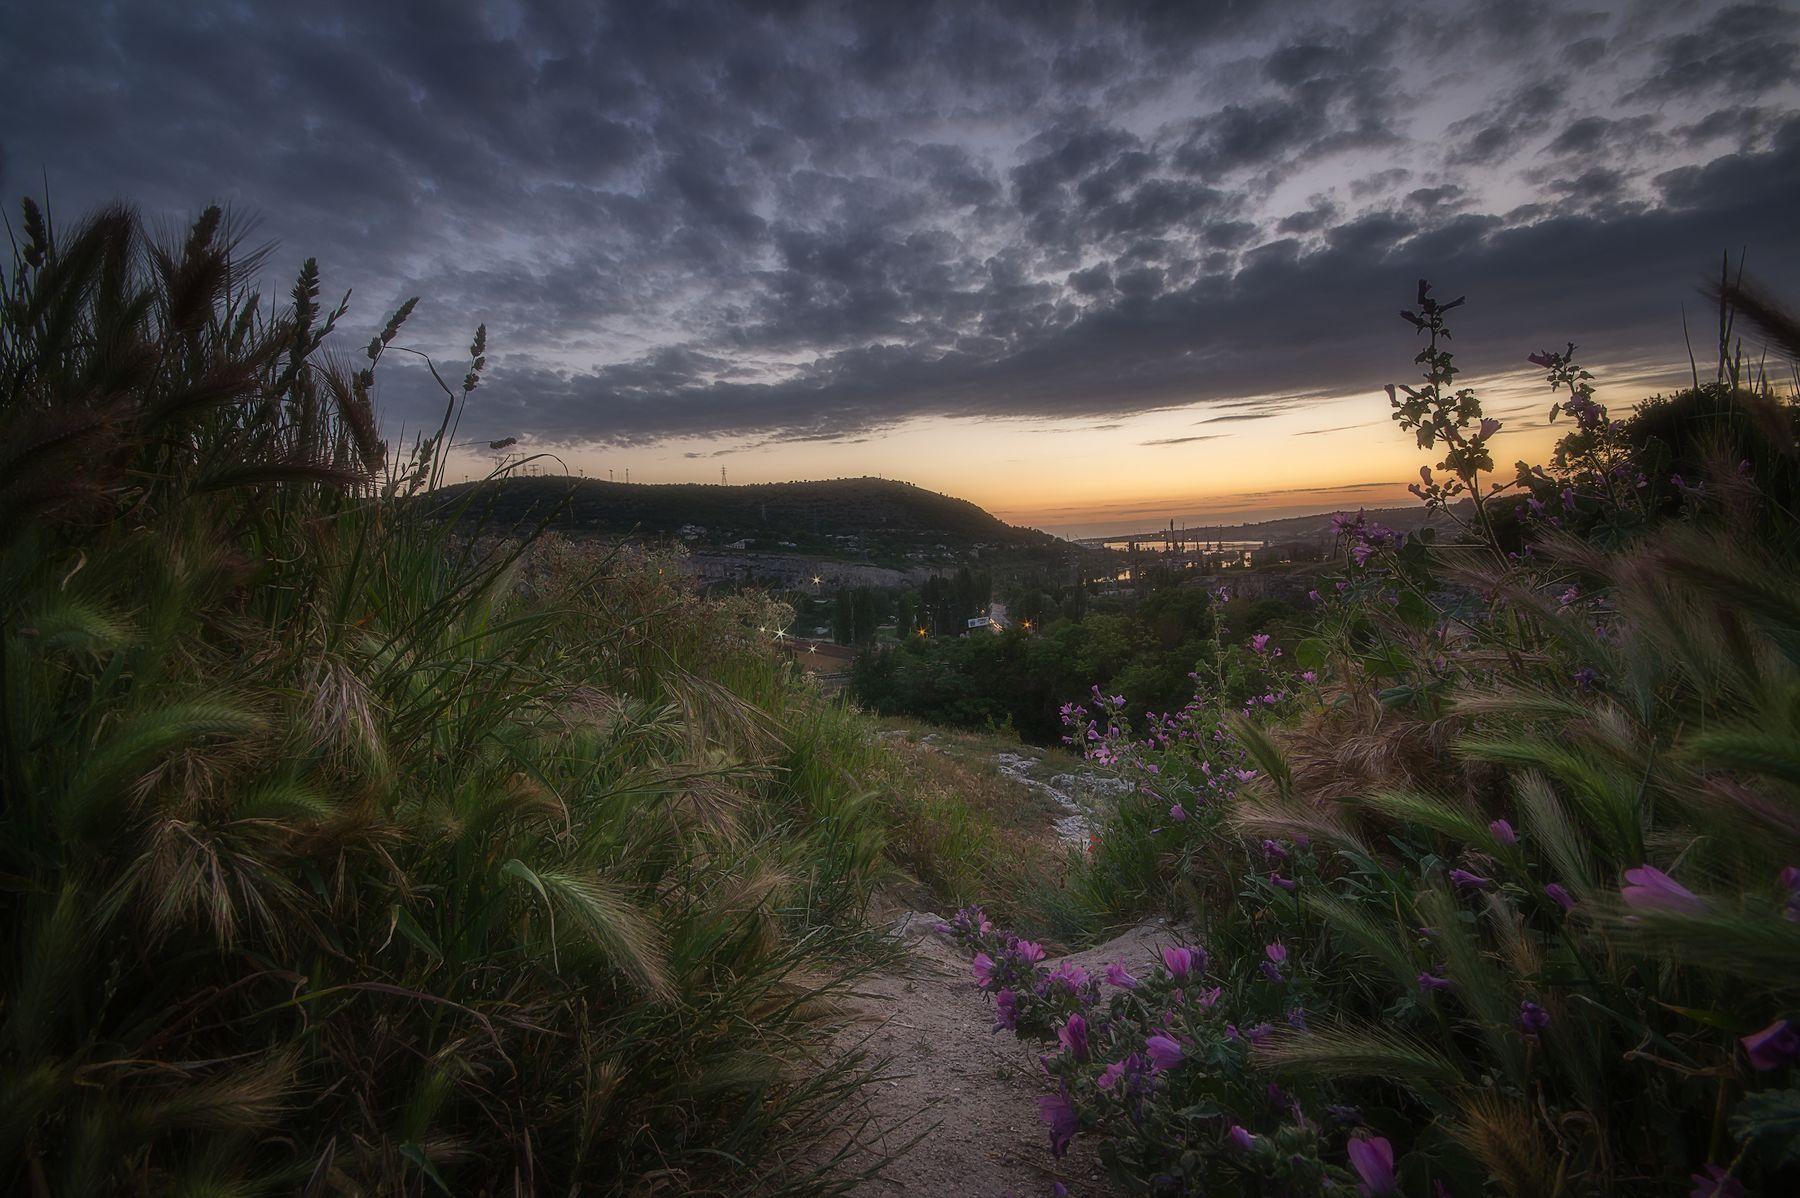 Вечерние травы цветы пейзаж природа закат